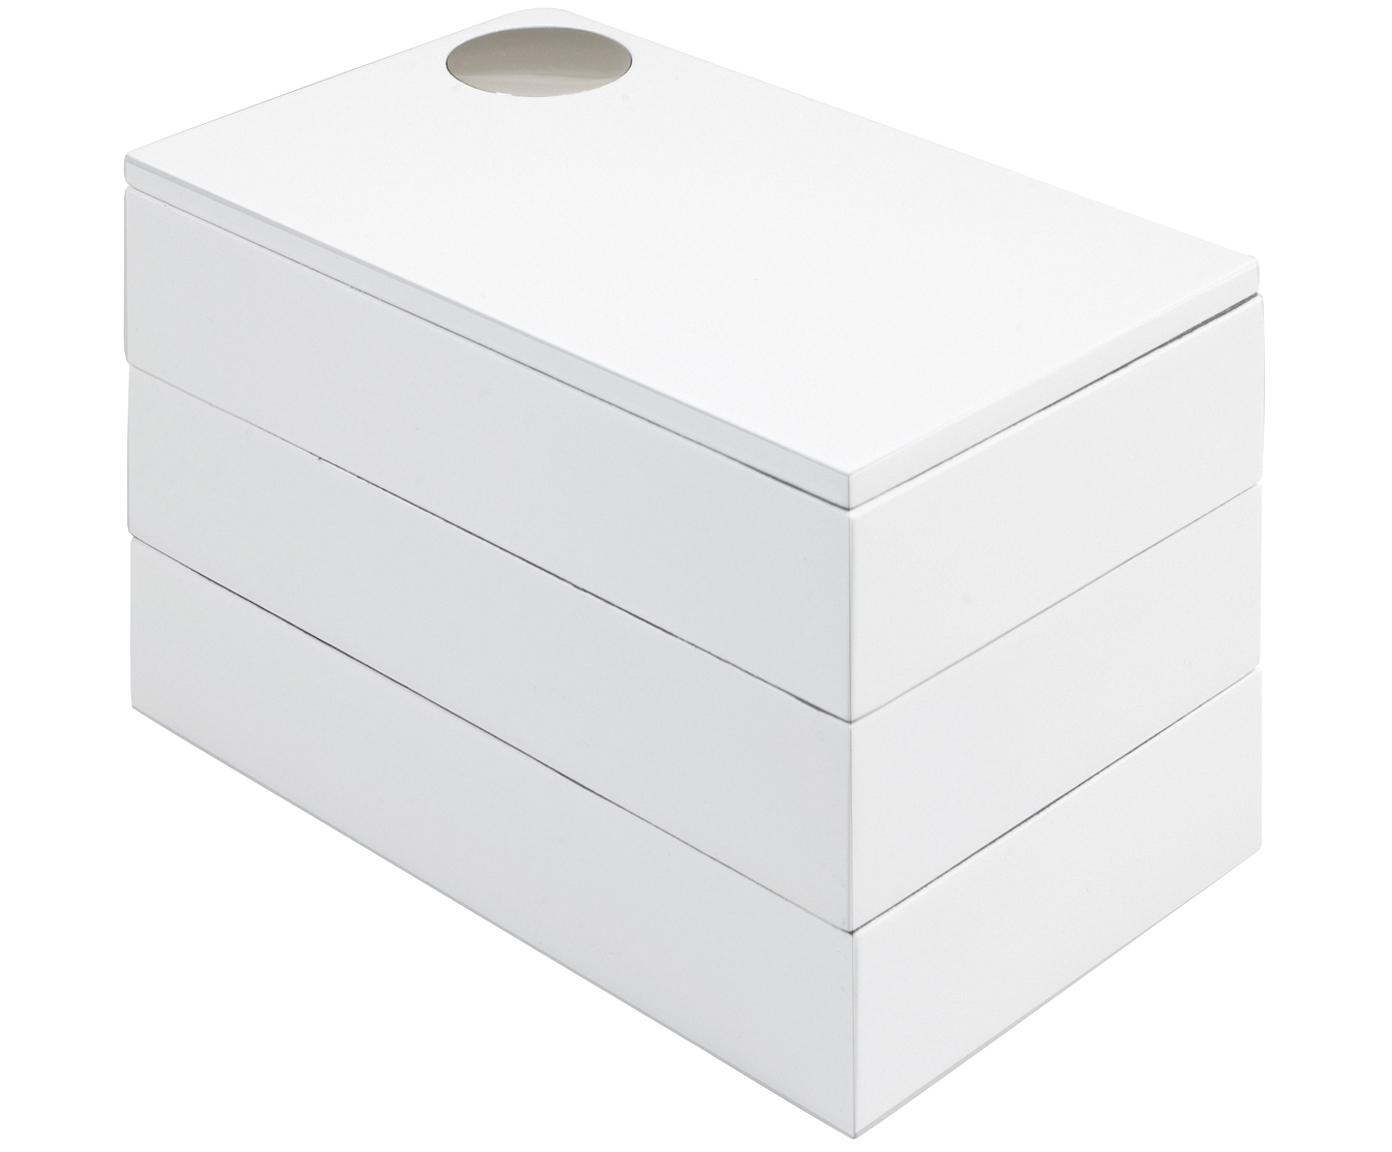 Schmuckbox Spindle, Buchenholz, lackiert, Weiss, 19 x 13 cm